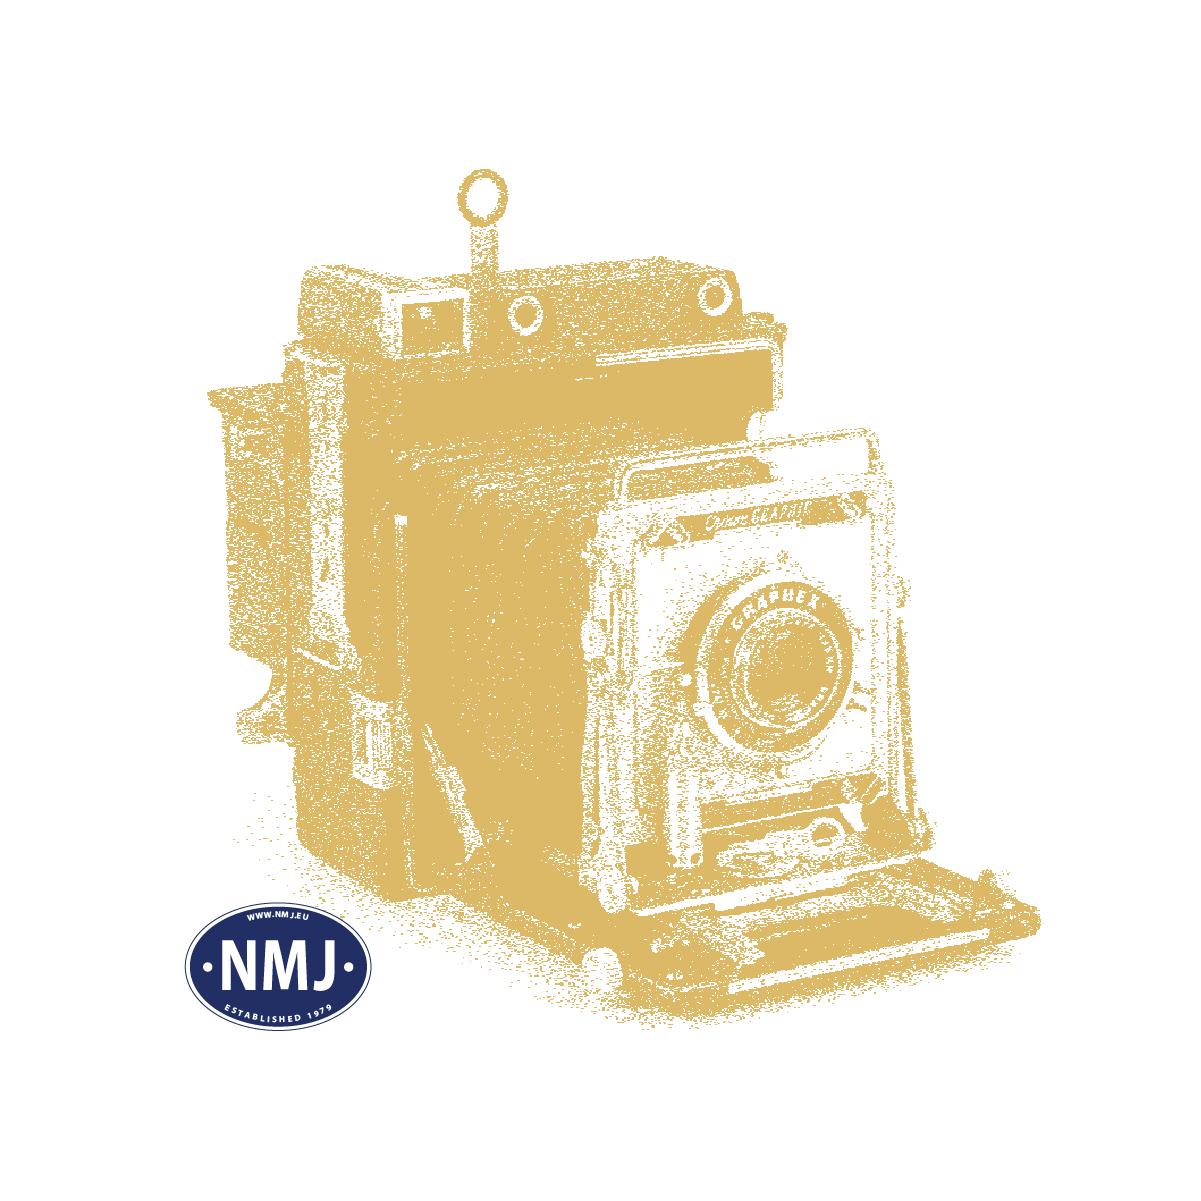 MWB-P402 - Gresstuster, Sommer, 4,5 mm, 21 x 15 Cm